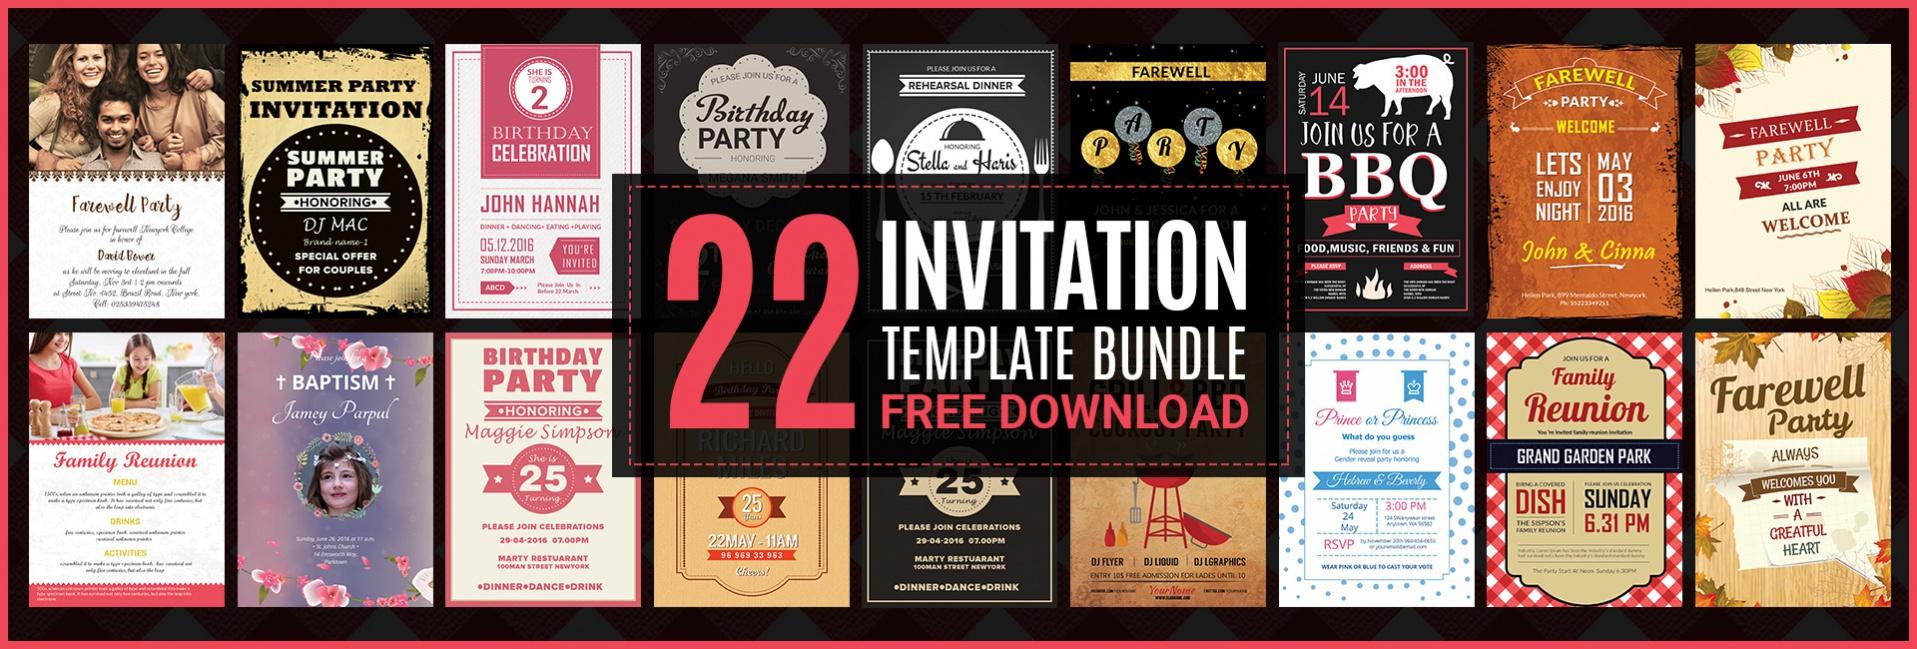 22+ Free Invitations (Birthday, Dinner, Reunion, BBQ) | Free ...